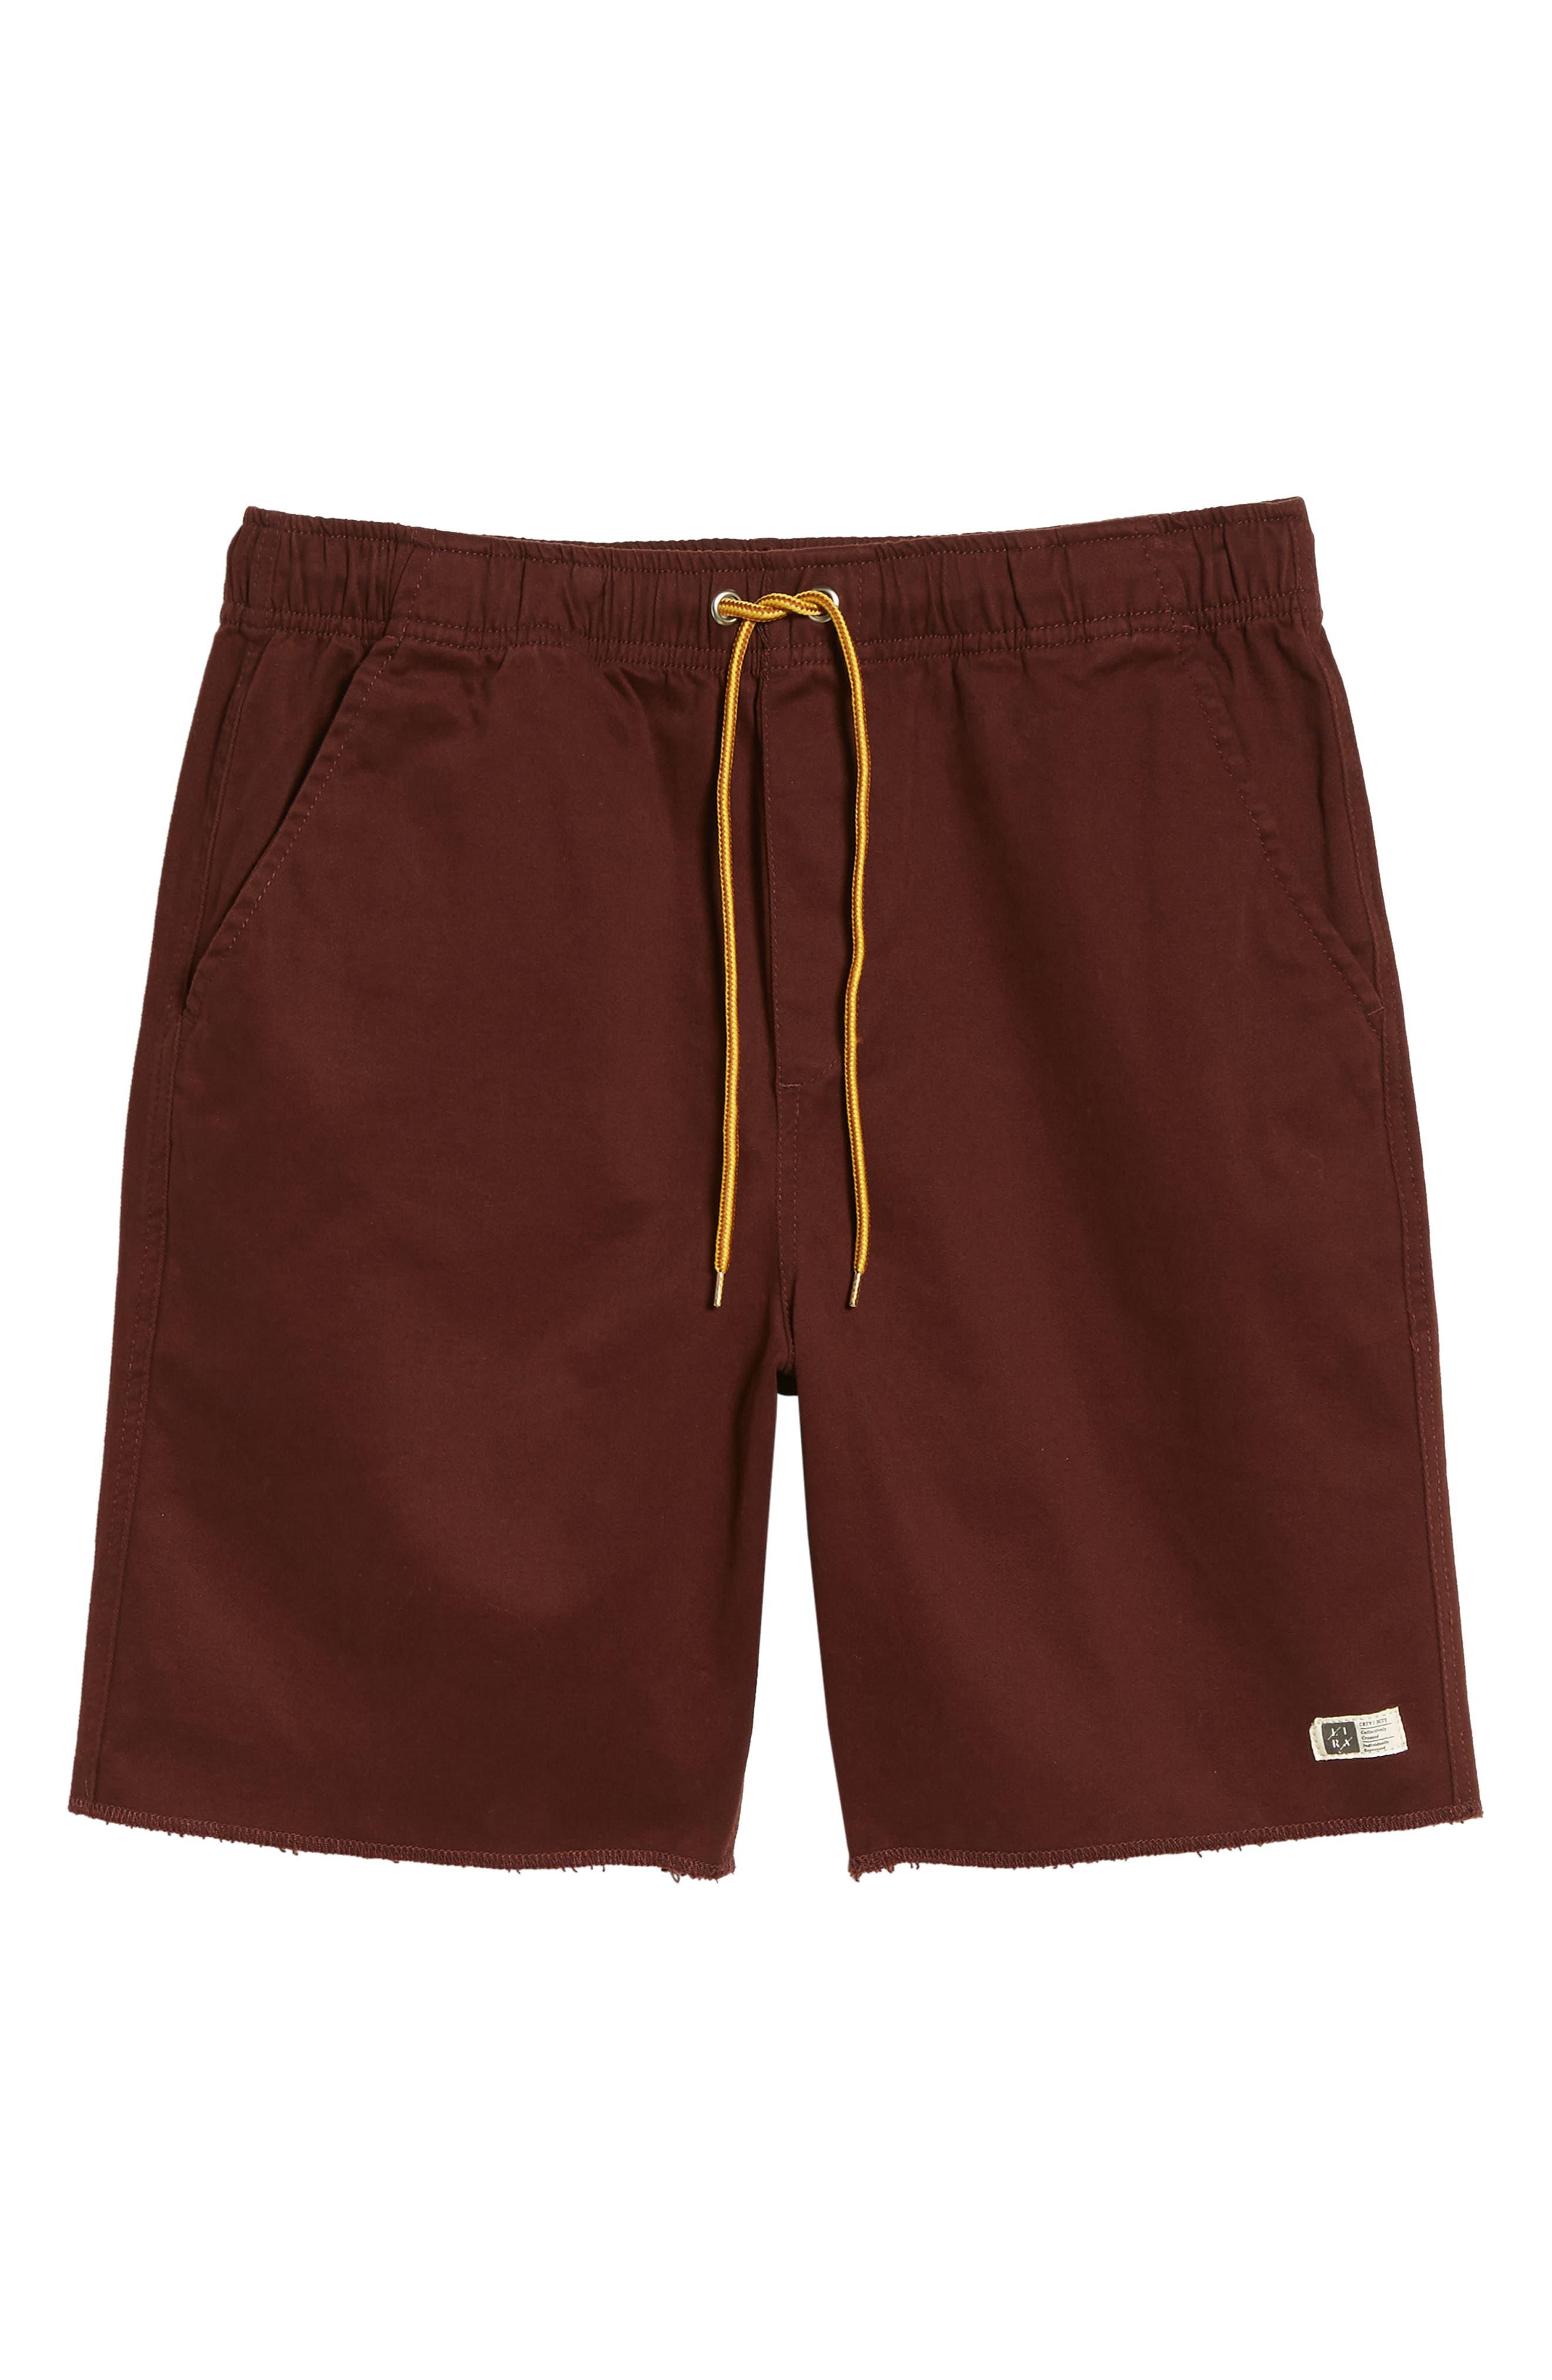 Weekday Shorts,                             Alternate thumbnail 6, color,                             BURGUNDY